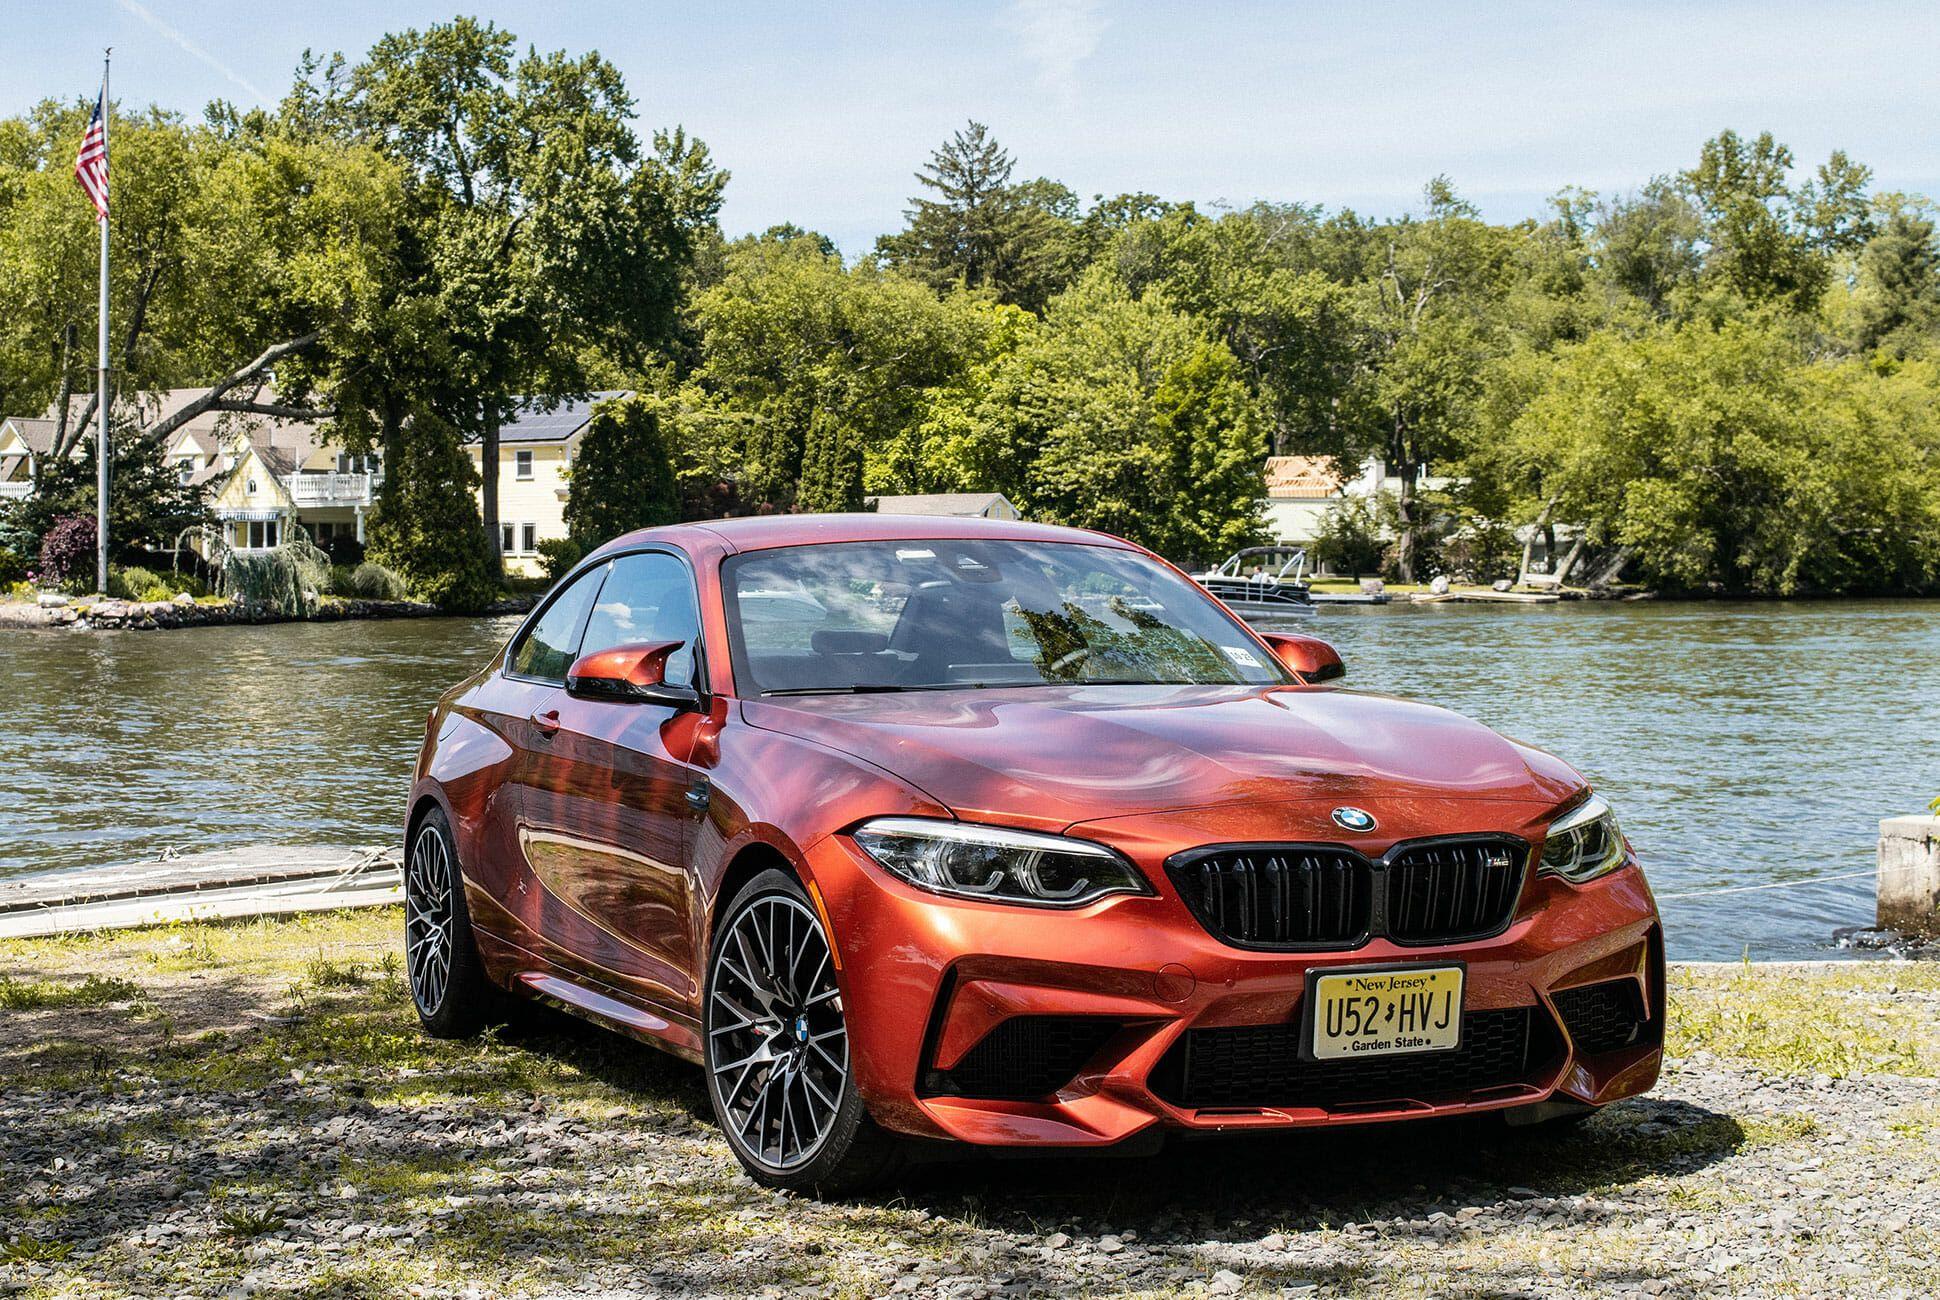 BMW-M2-Review-gear-patrol-slide-1-2